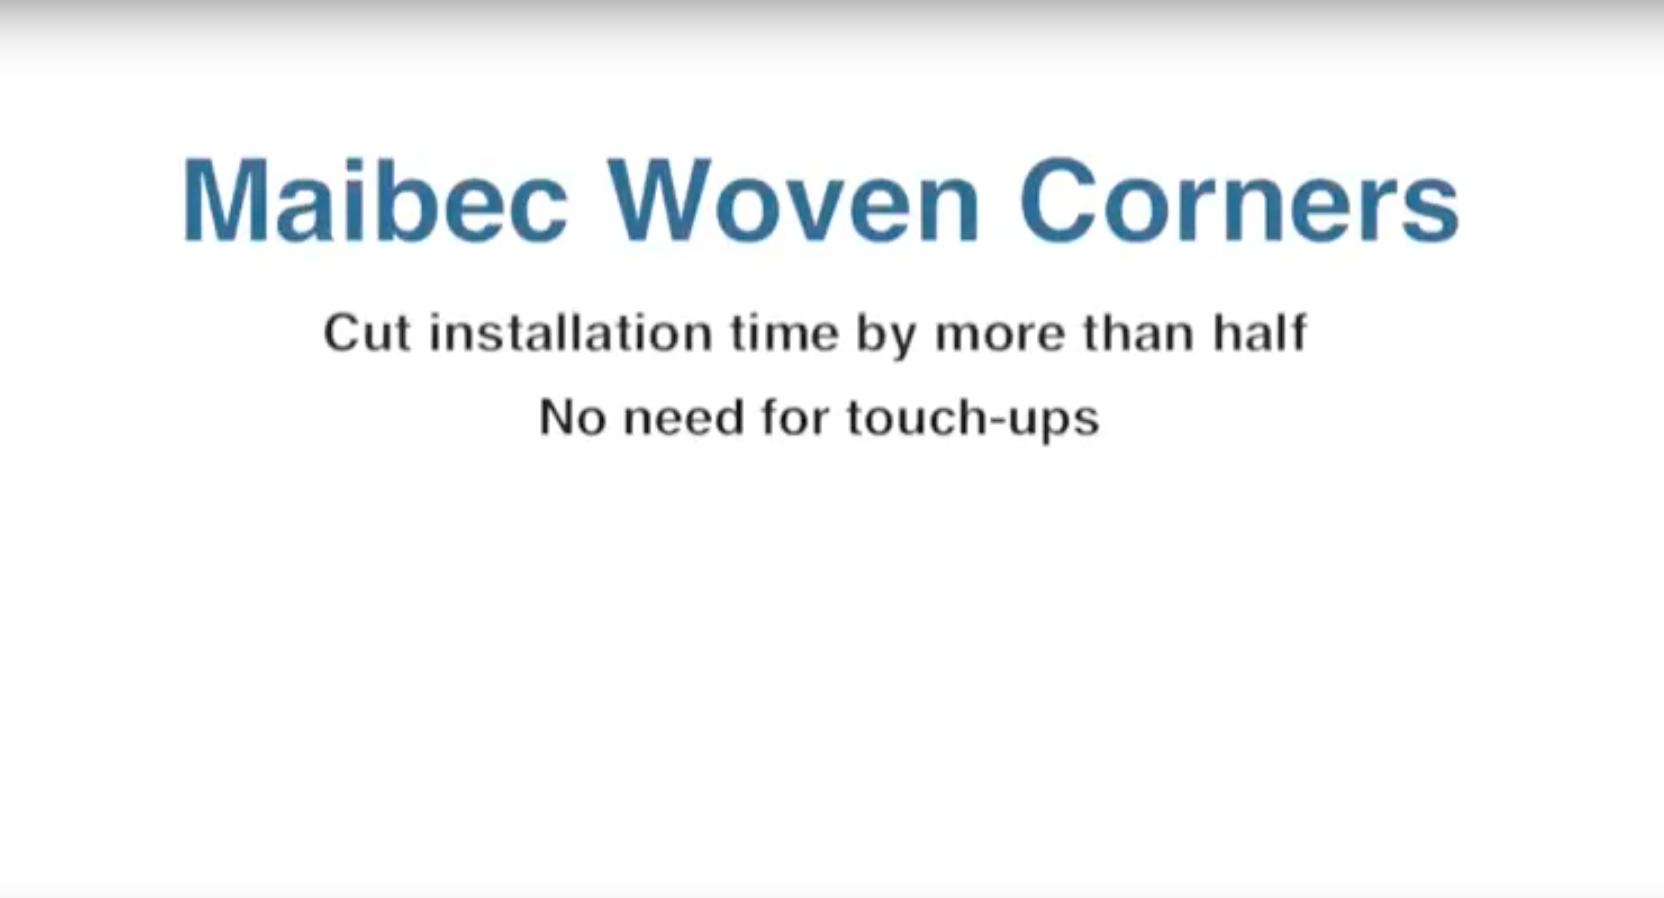 Maibec Woven Corners Installation